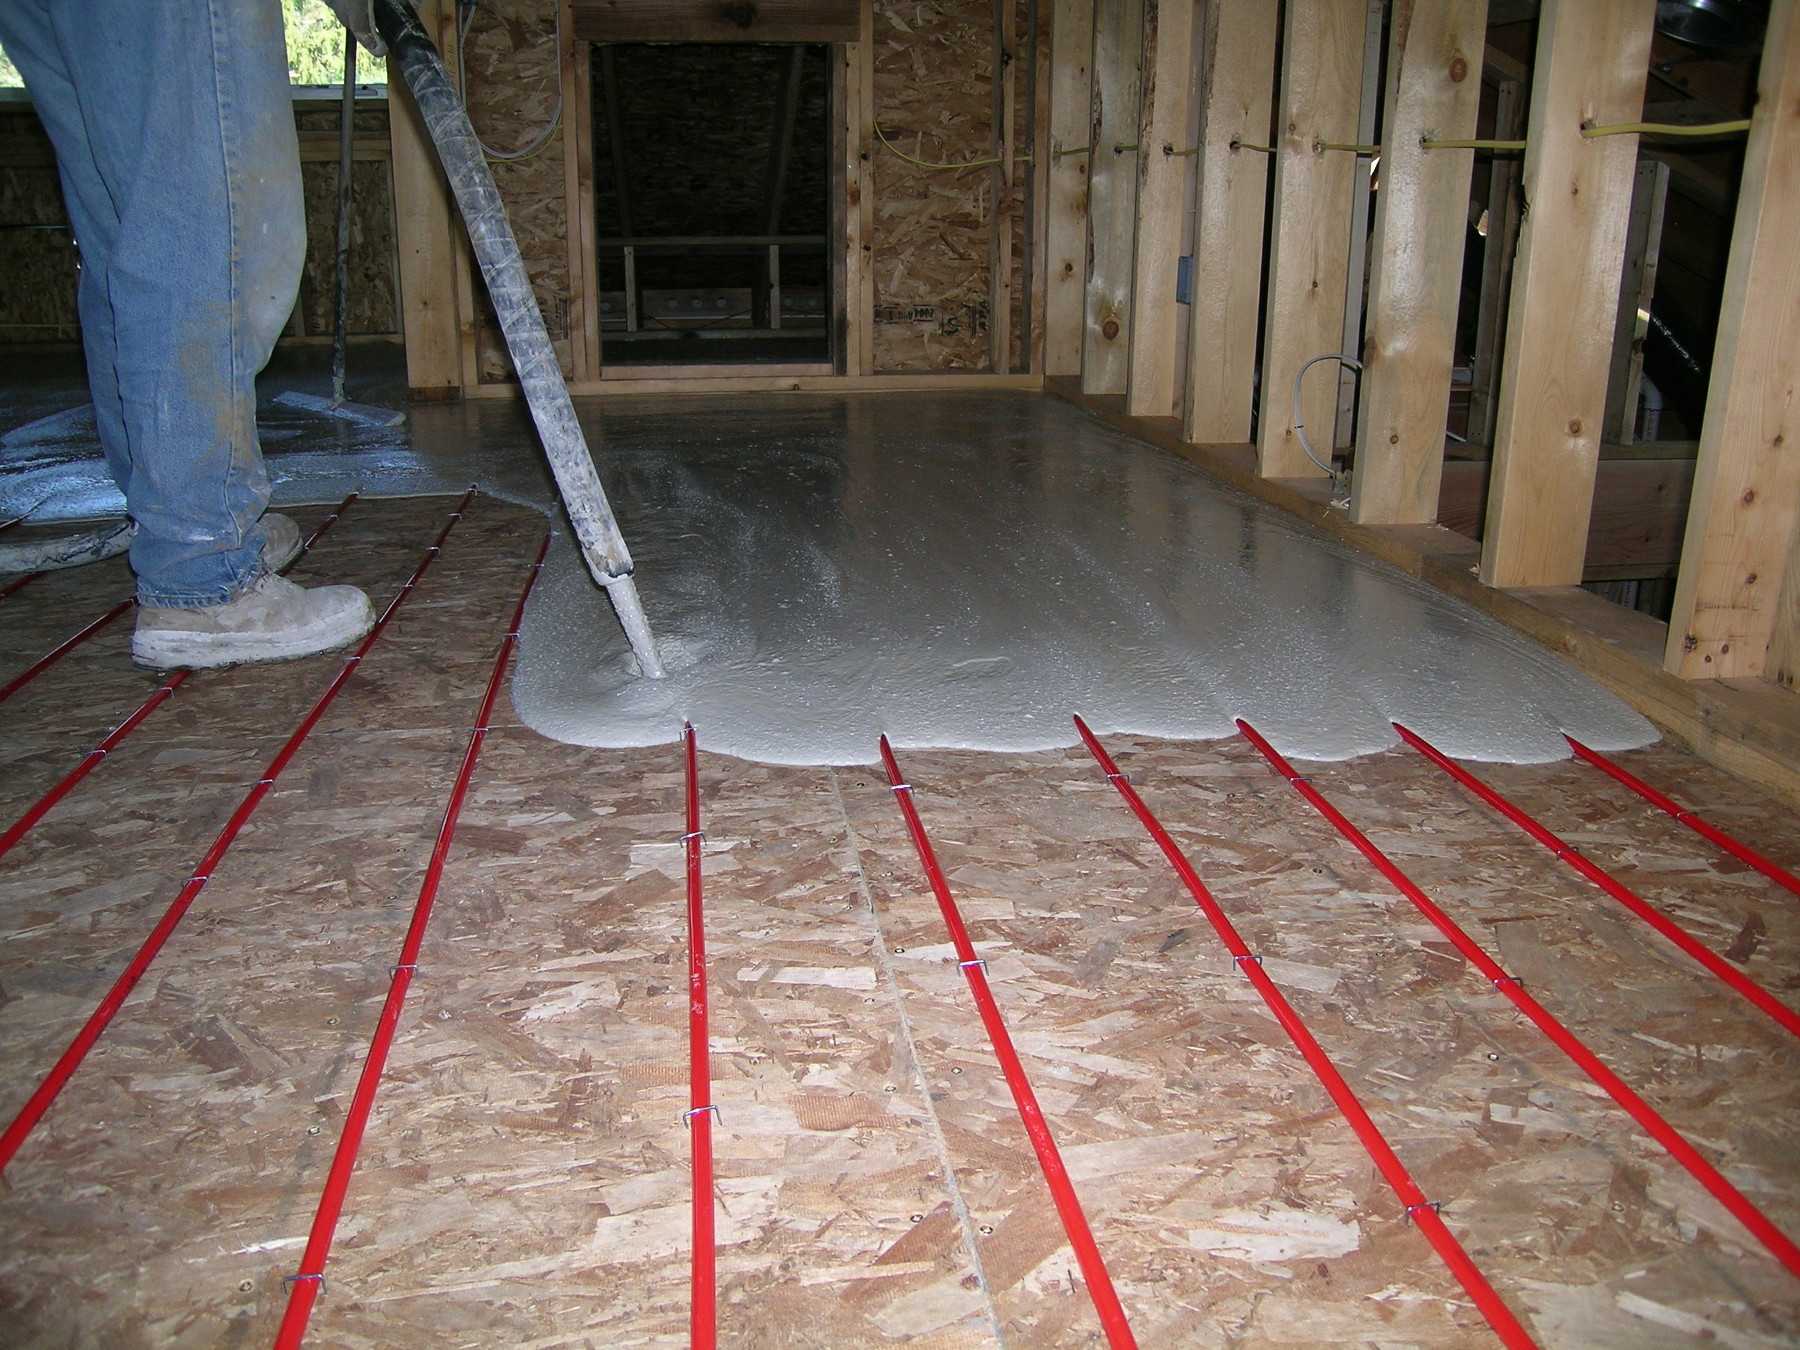 Janes Radiant Install Floor Heating Yourself